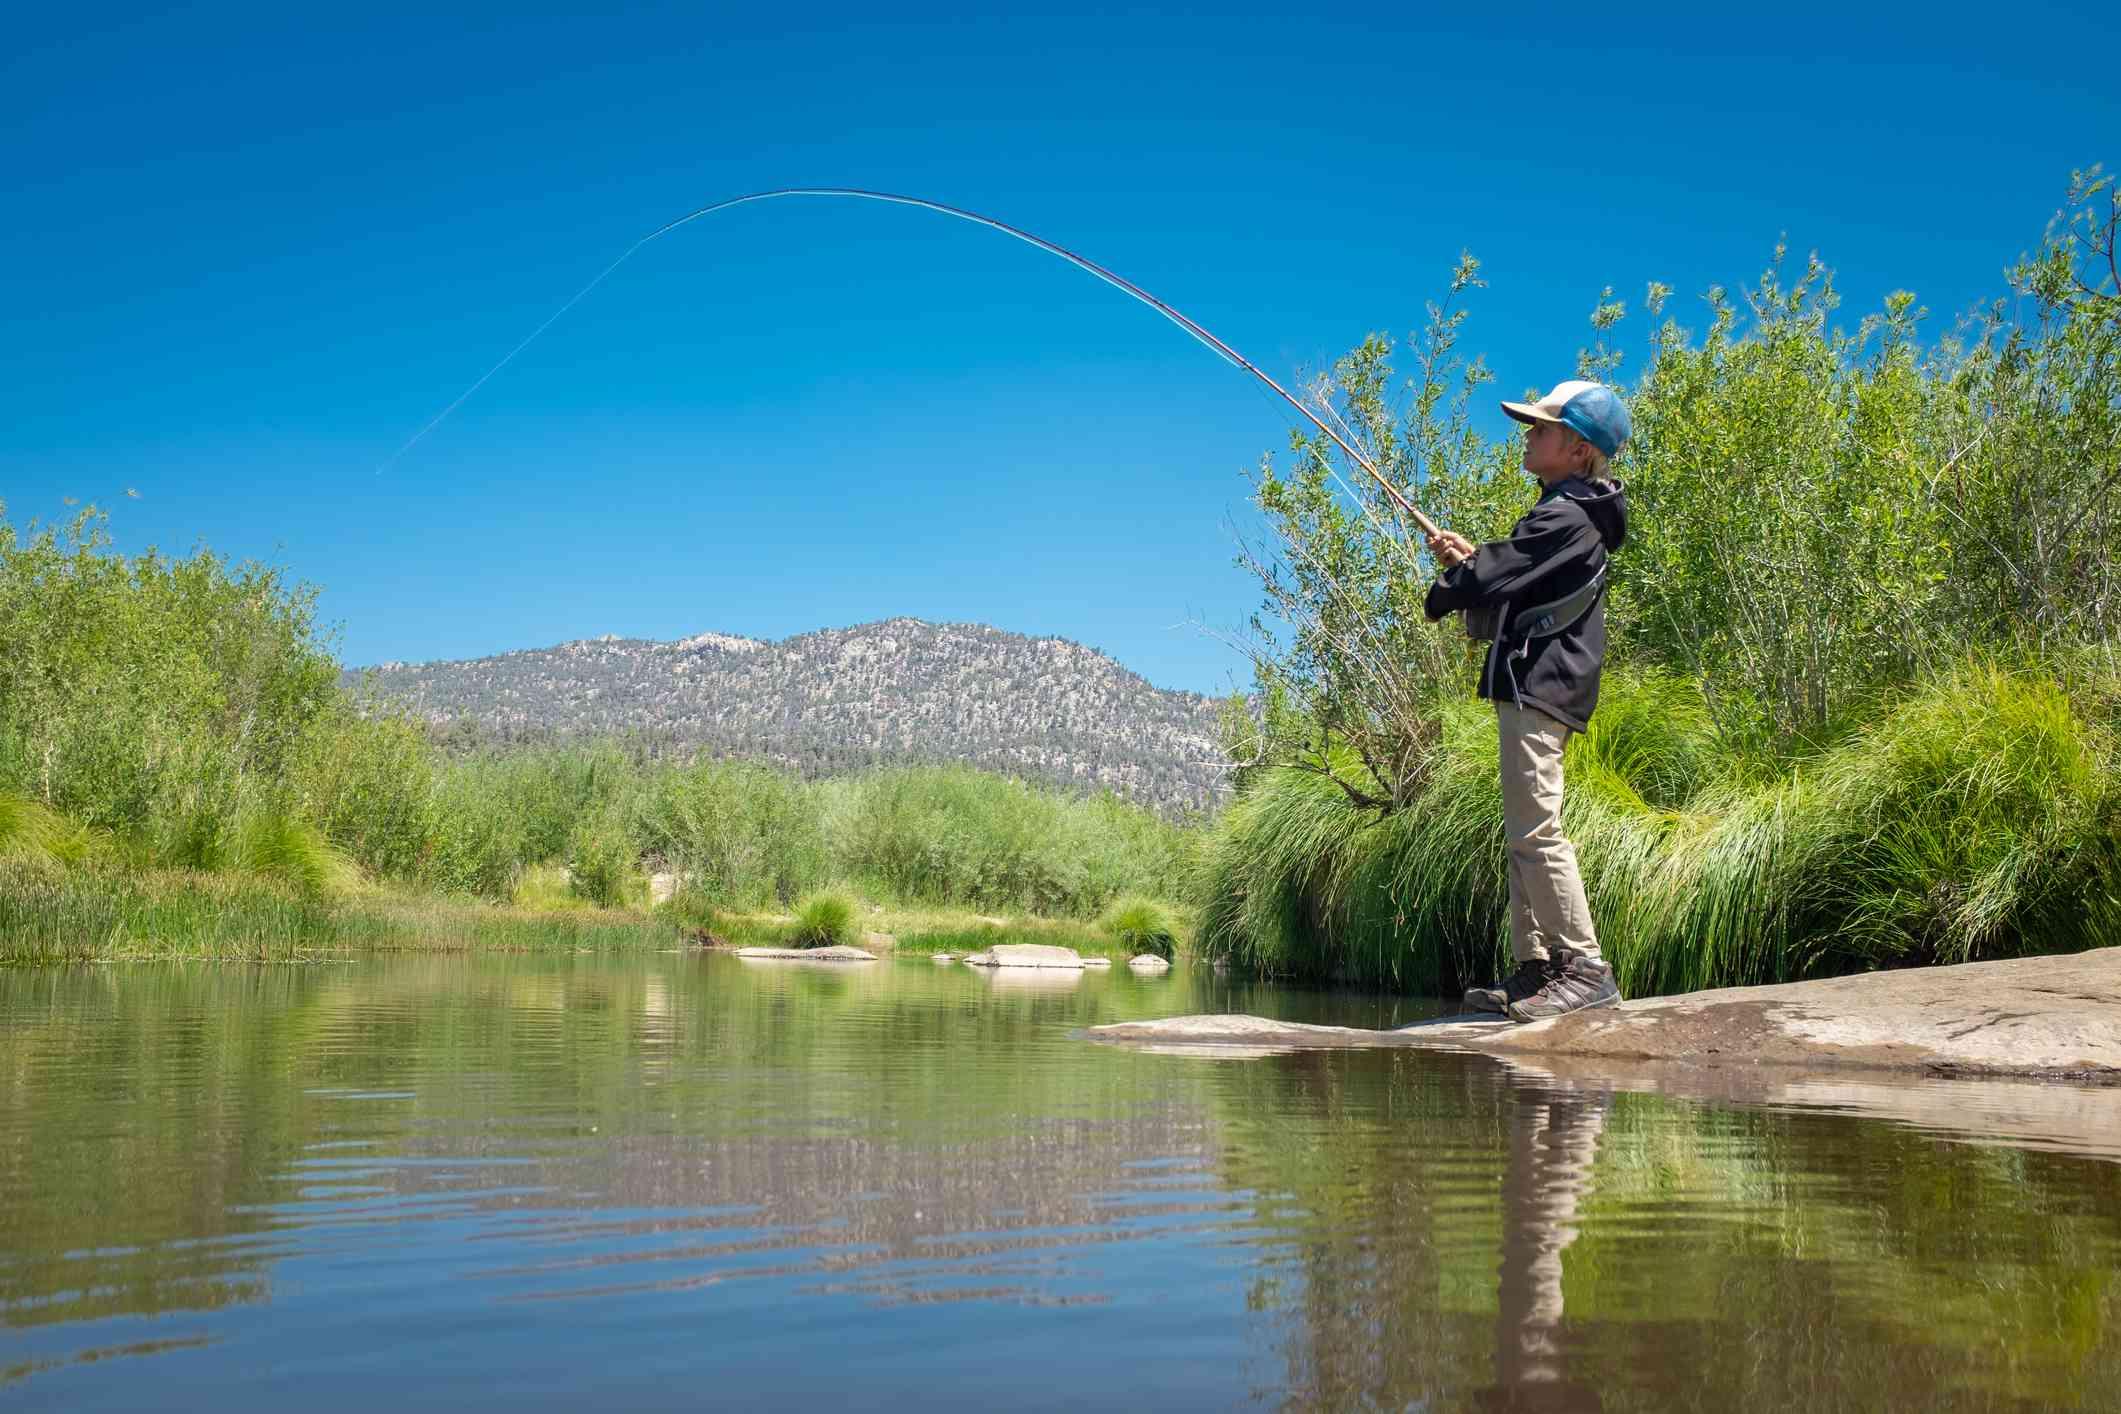 8 Year Old Boy Fly Fishing